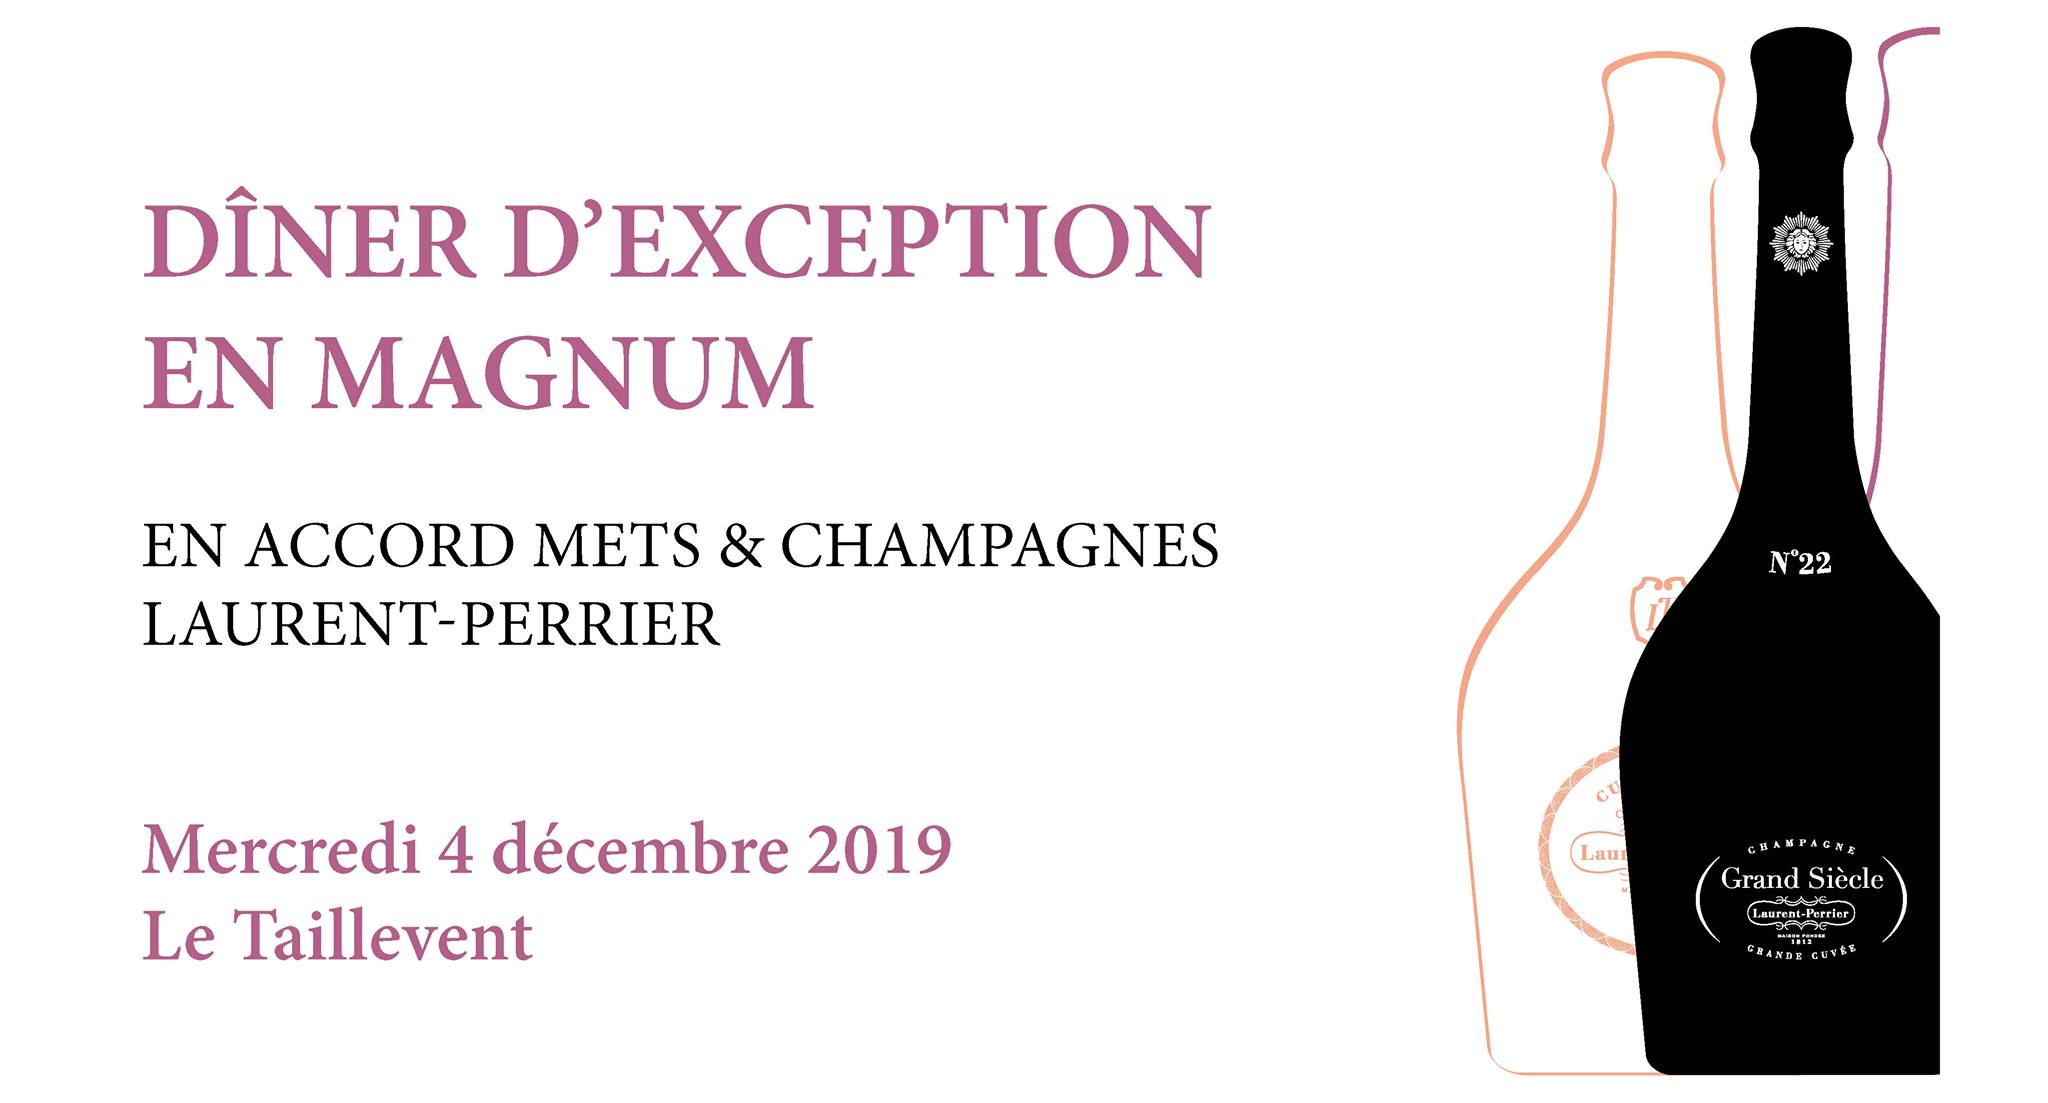 52 Martinis Paris Food & Drink Event